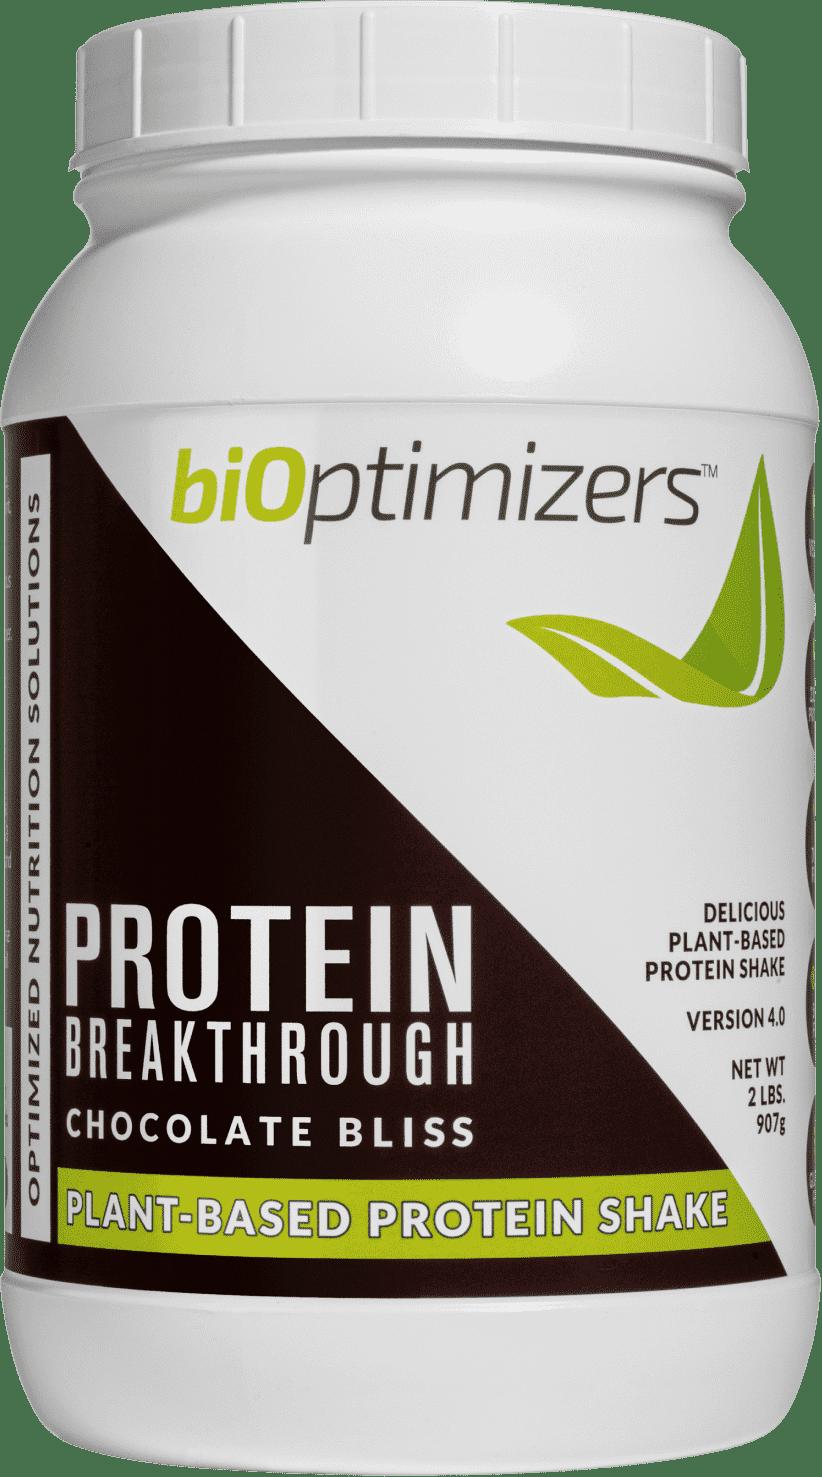 Plant-Based Protein Shake